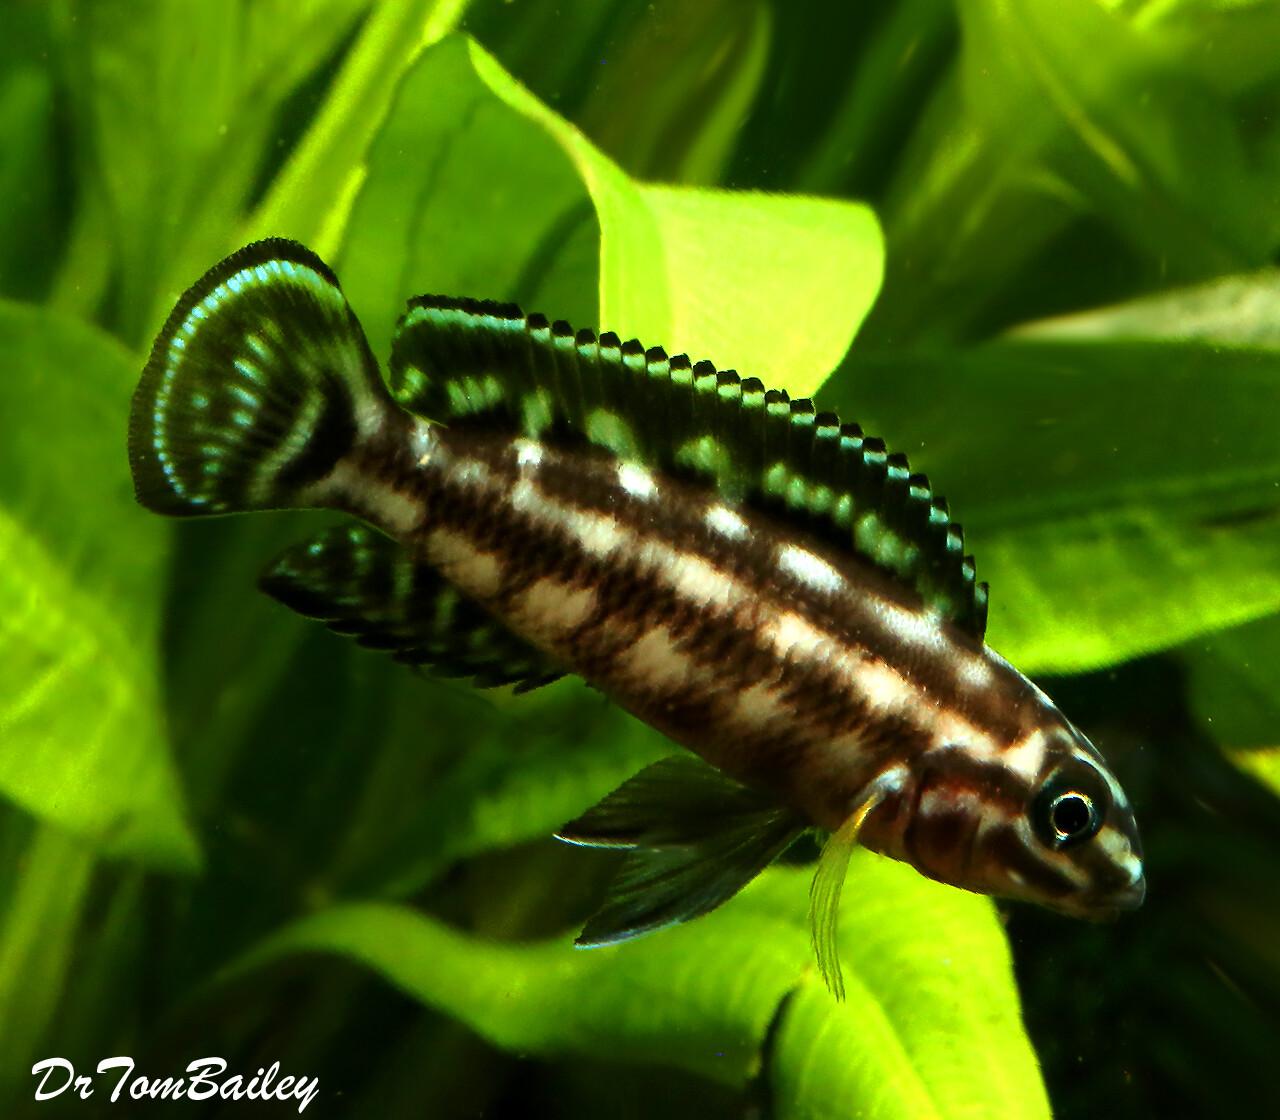 "Premium Lake Tanganyika Plaid Juli Cichlid, Julidochromis marlieri, Size: 1.5"" to 2"""